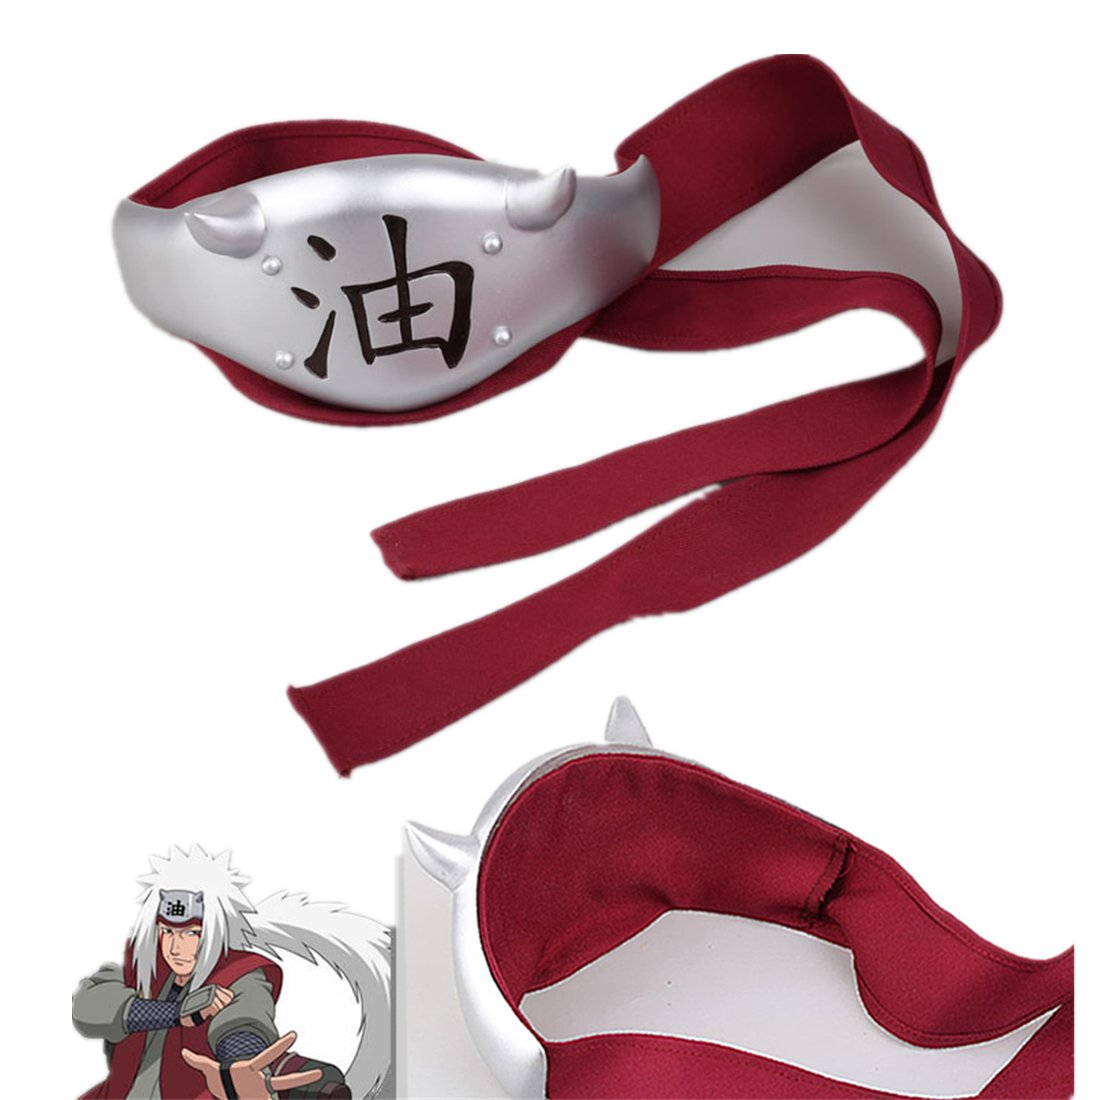 Love Anime Ninja Shinobi Cosplay Accessories Prop-Jiraiya Headband